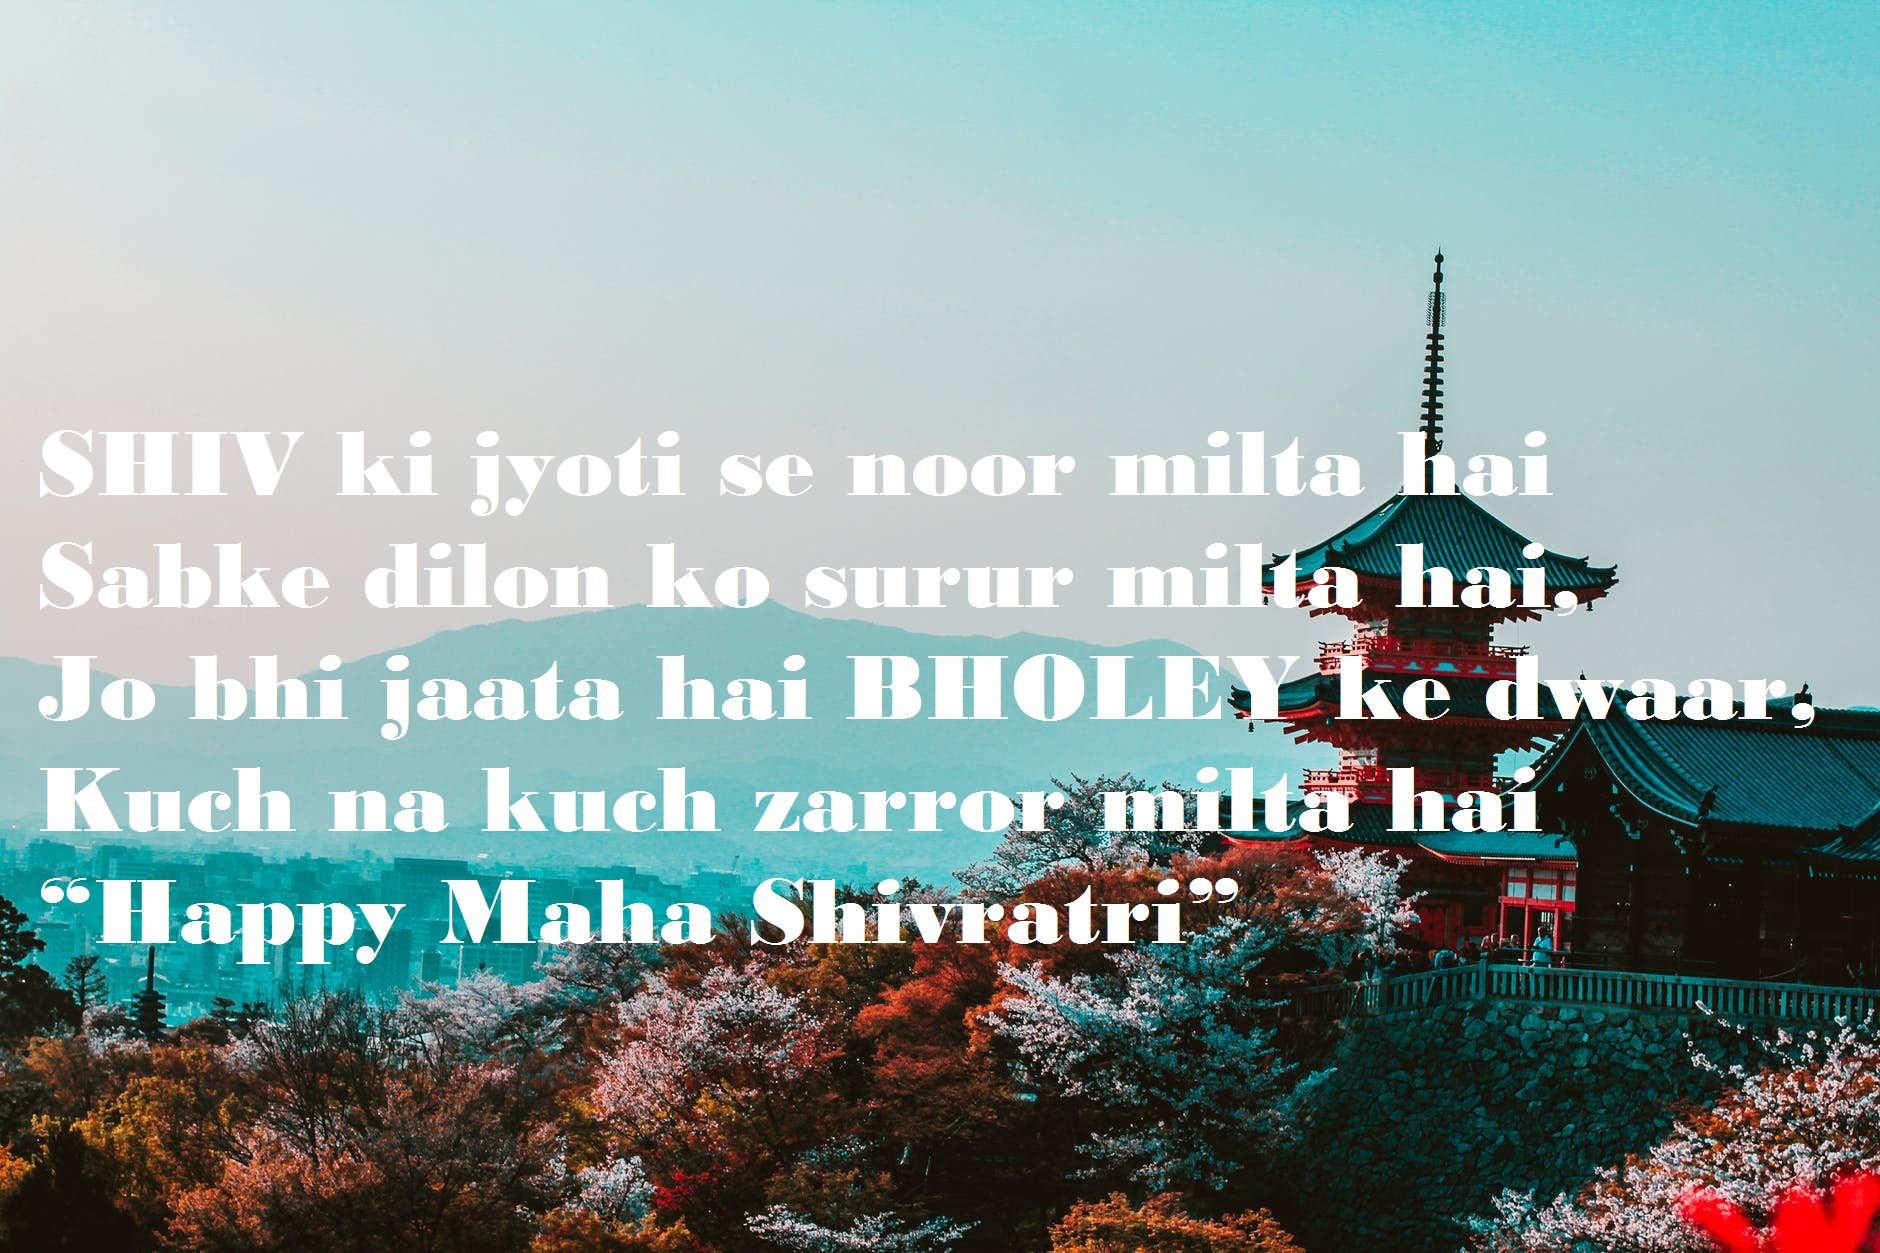 Shivaratri Wishes